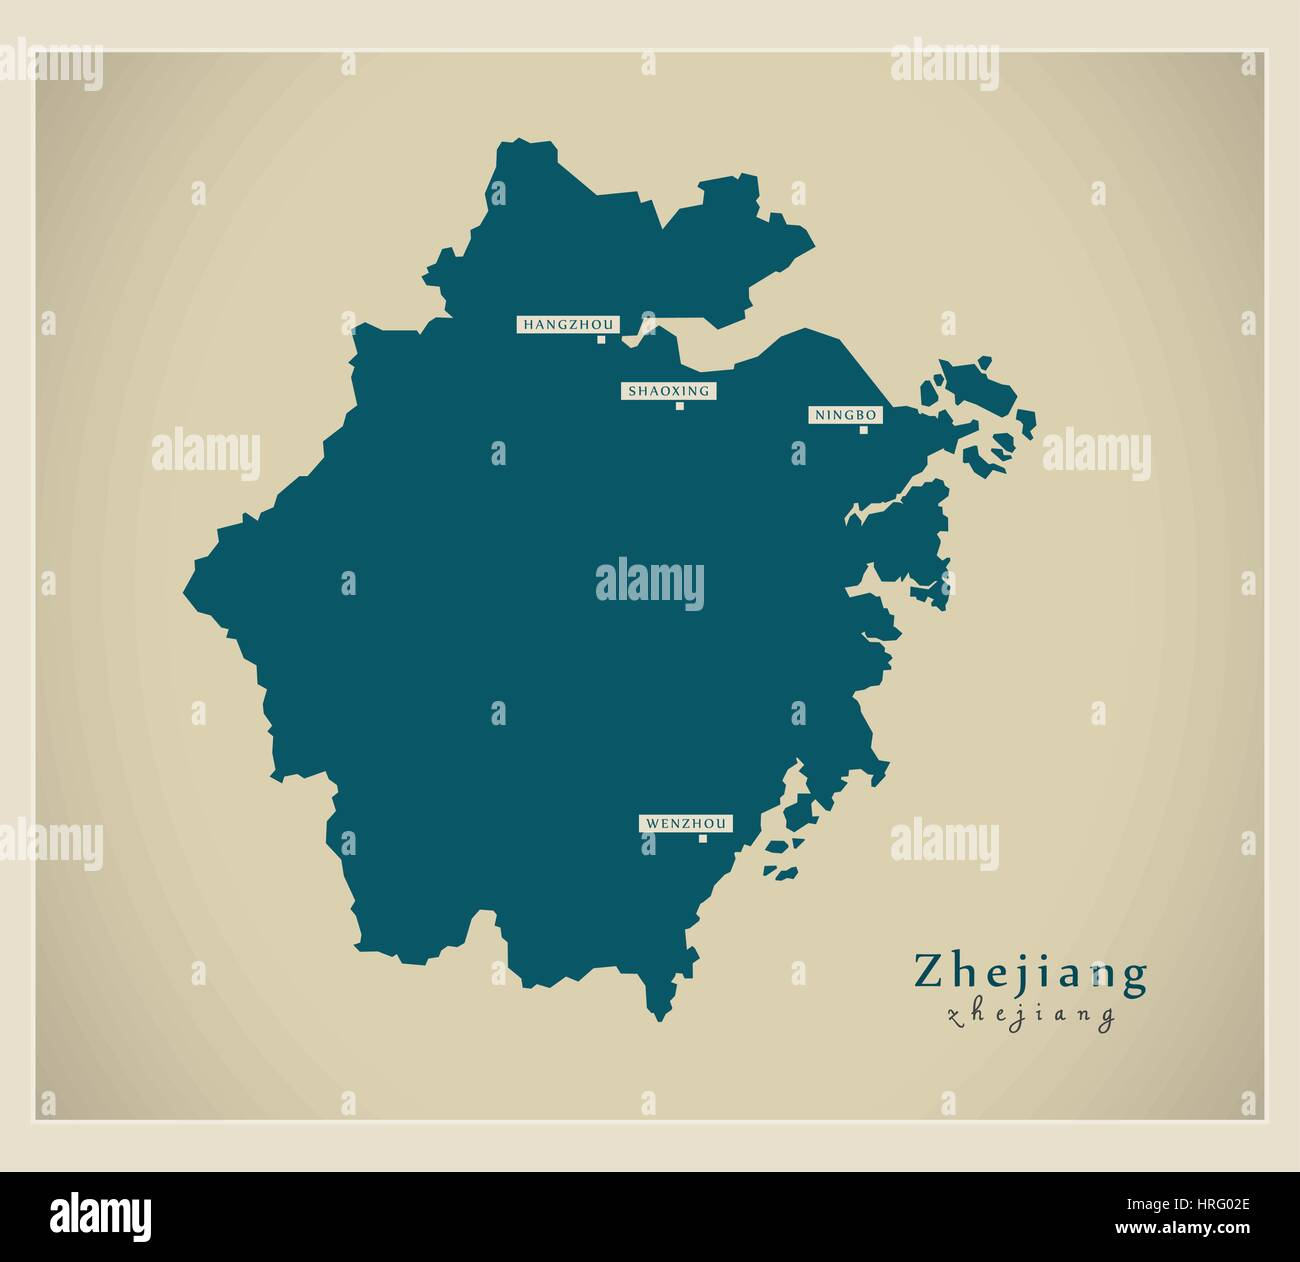 Modern Map - Zhejiang - Stock Image